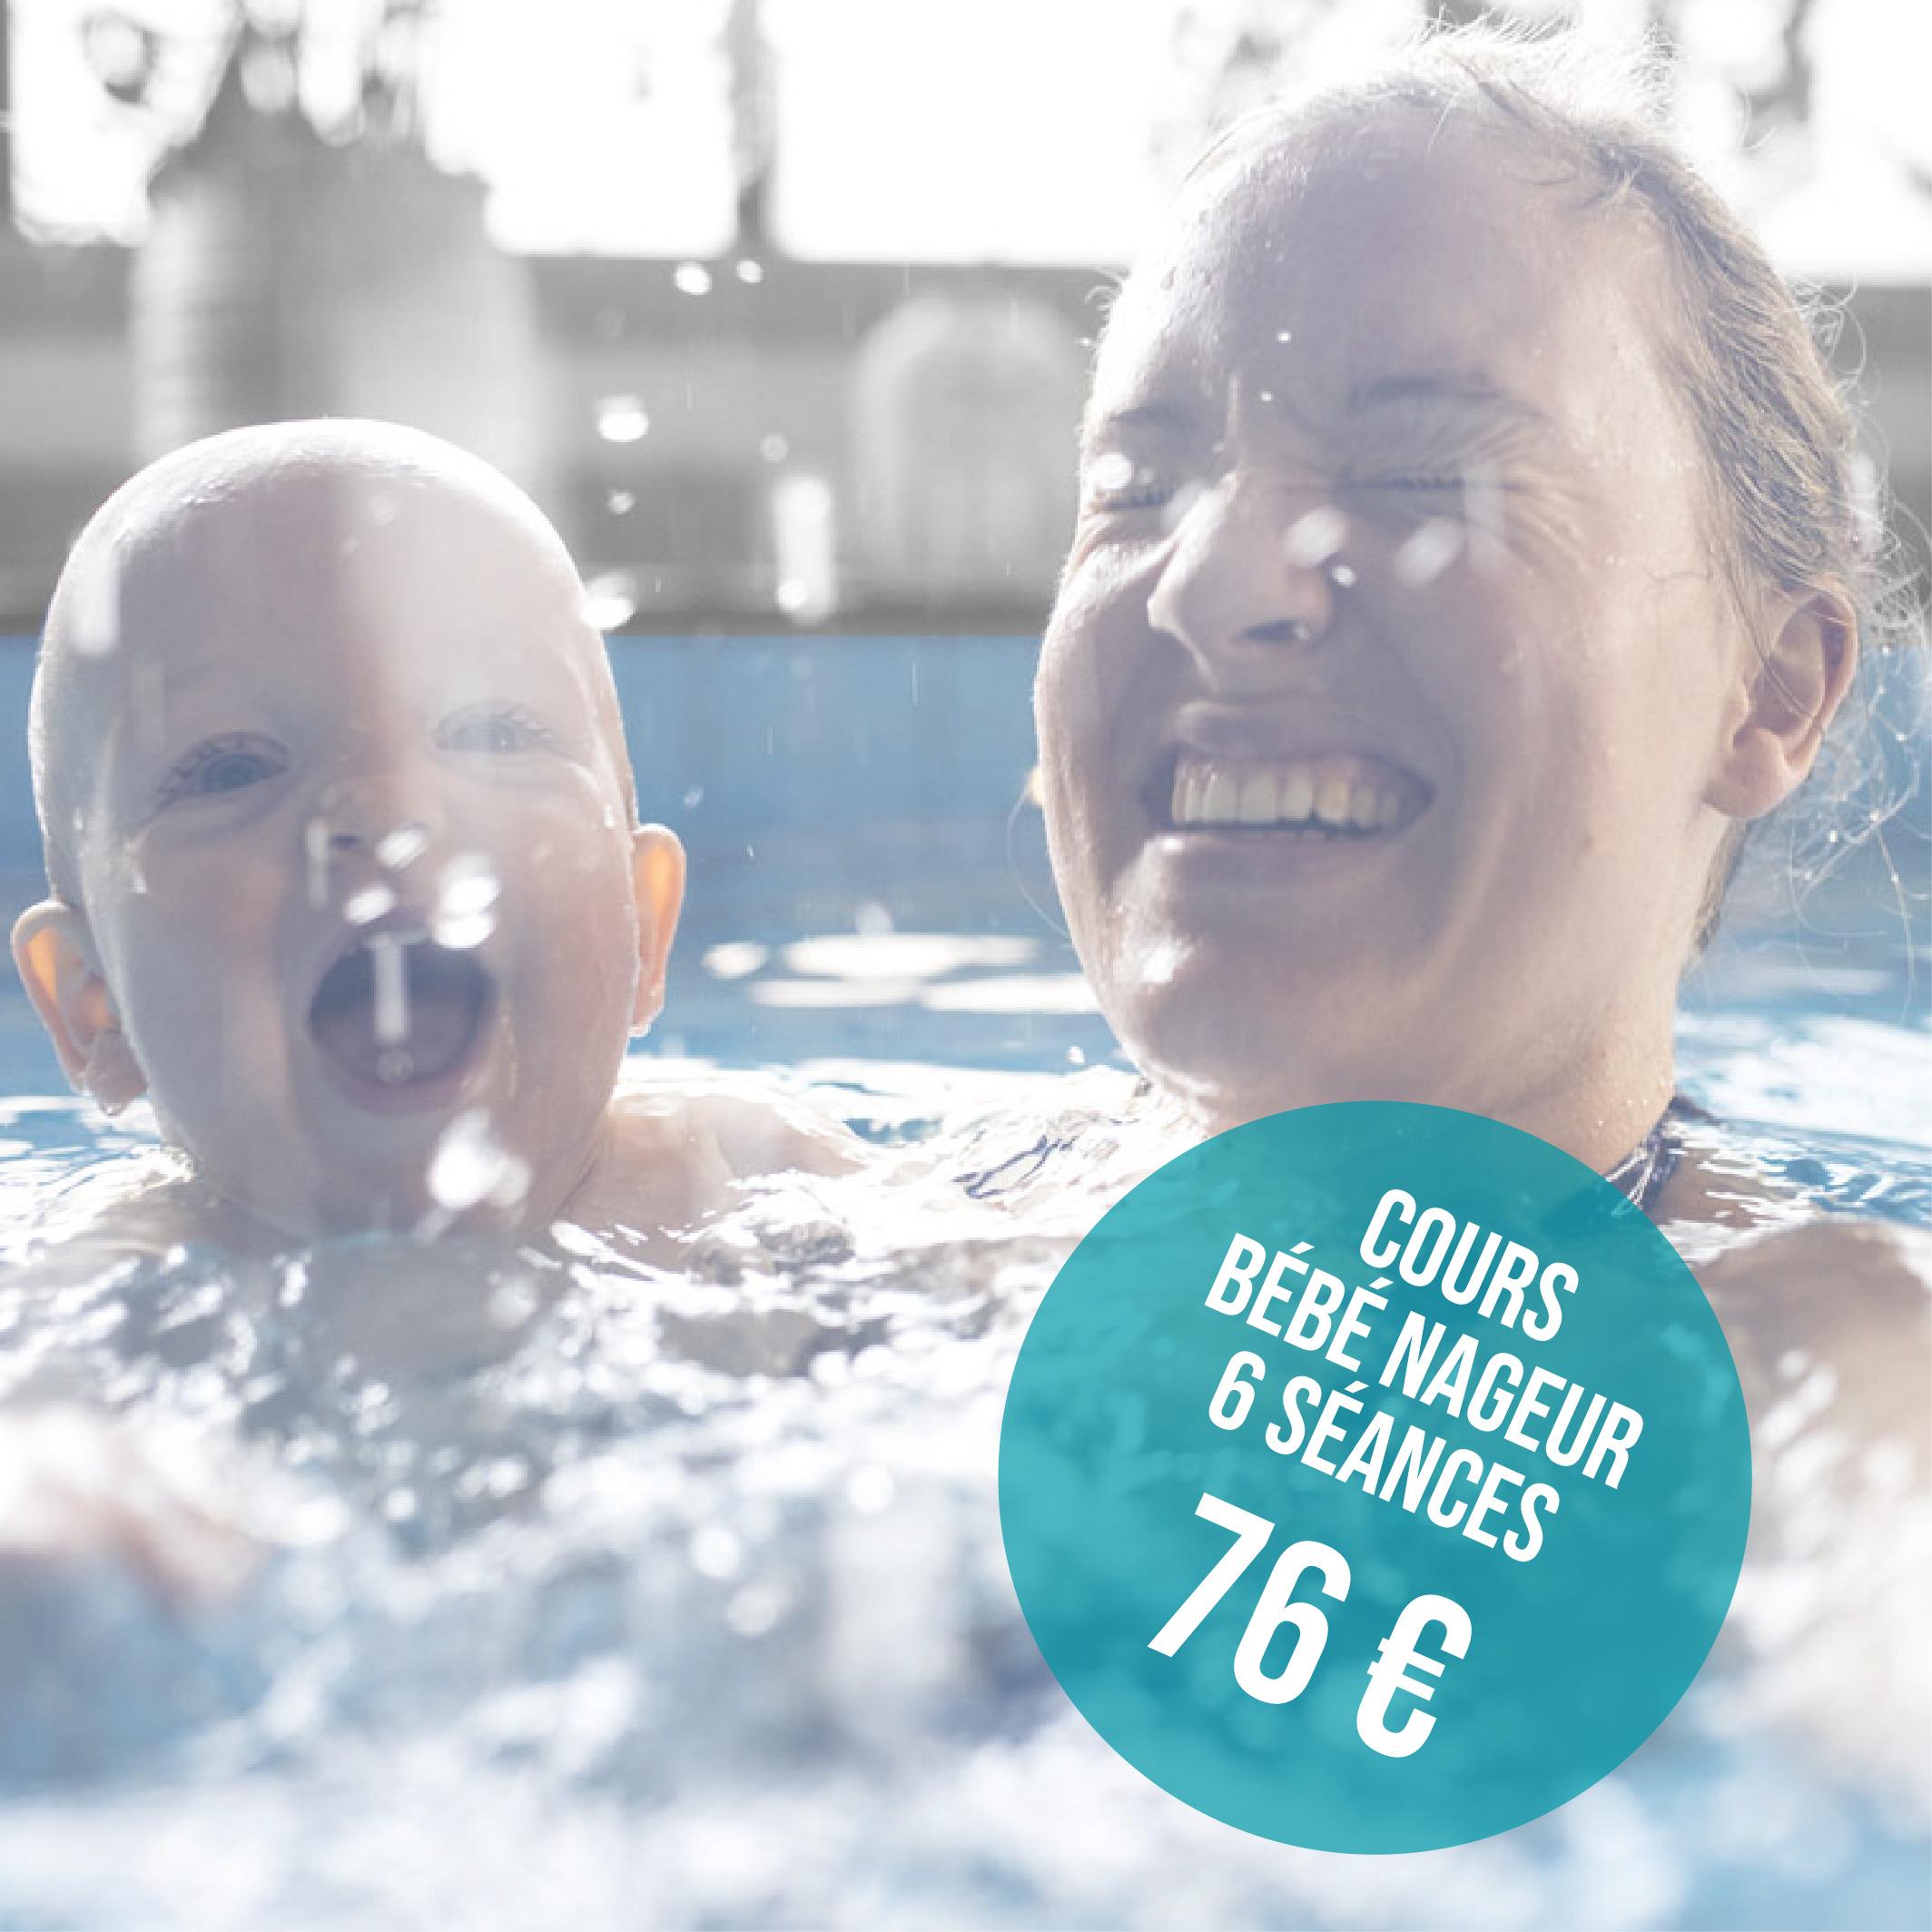 tarif bébé nageur 6 séances